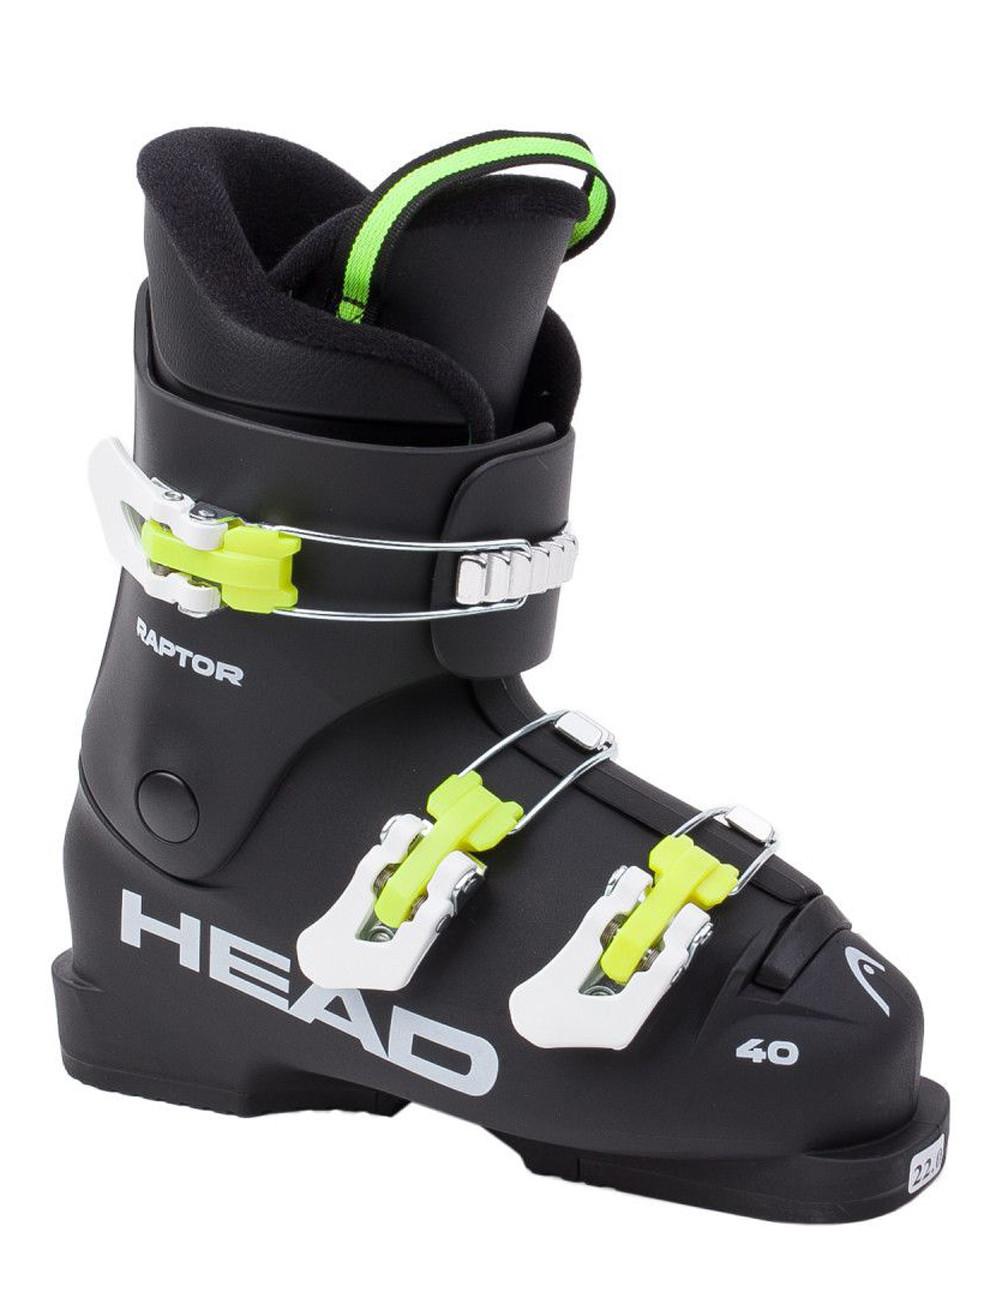 Buty narciarskie Head Raptor 40